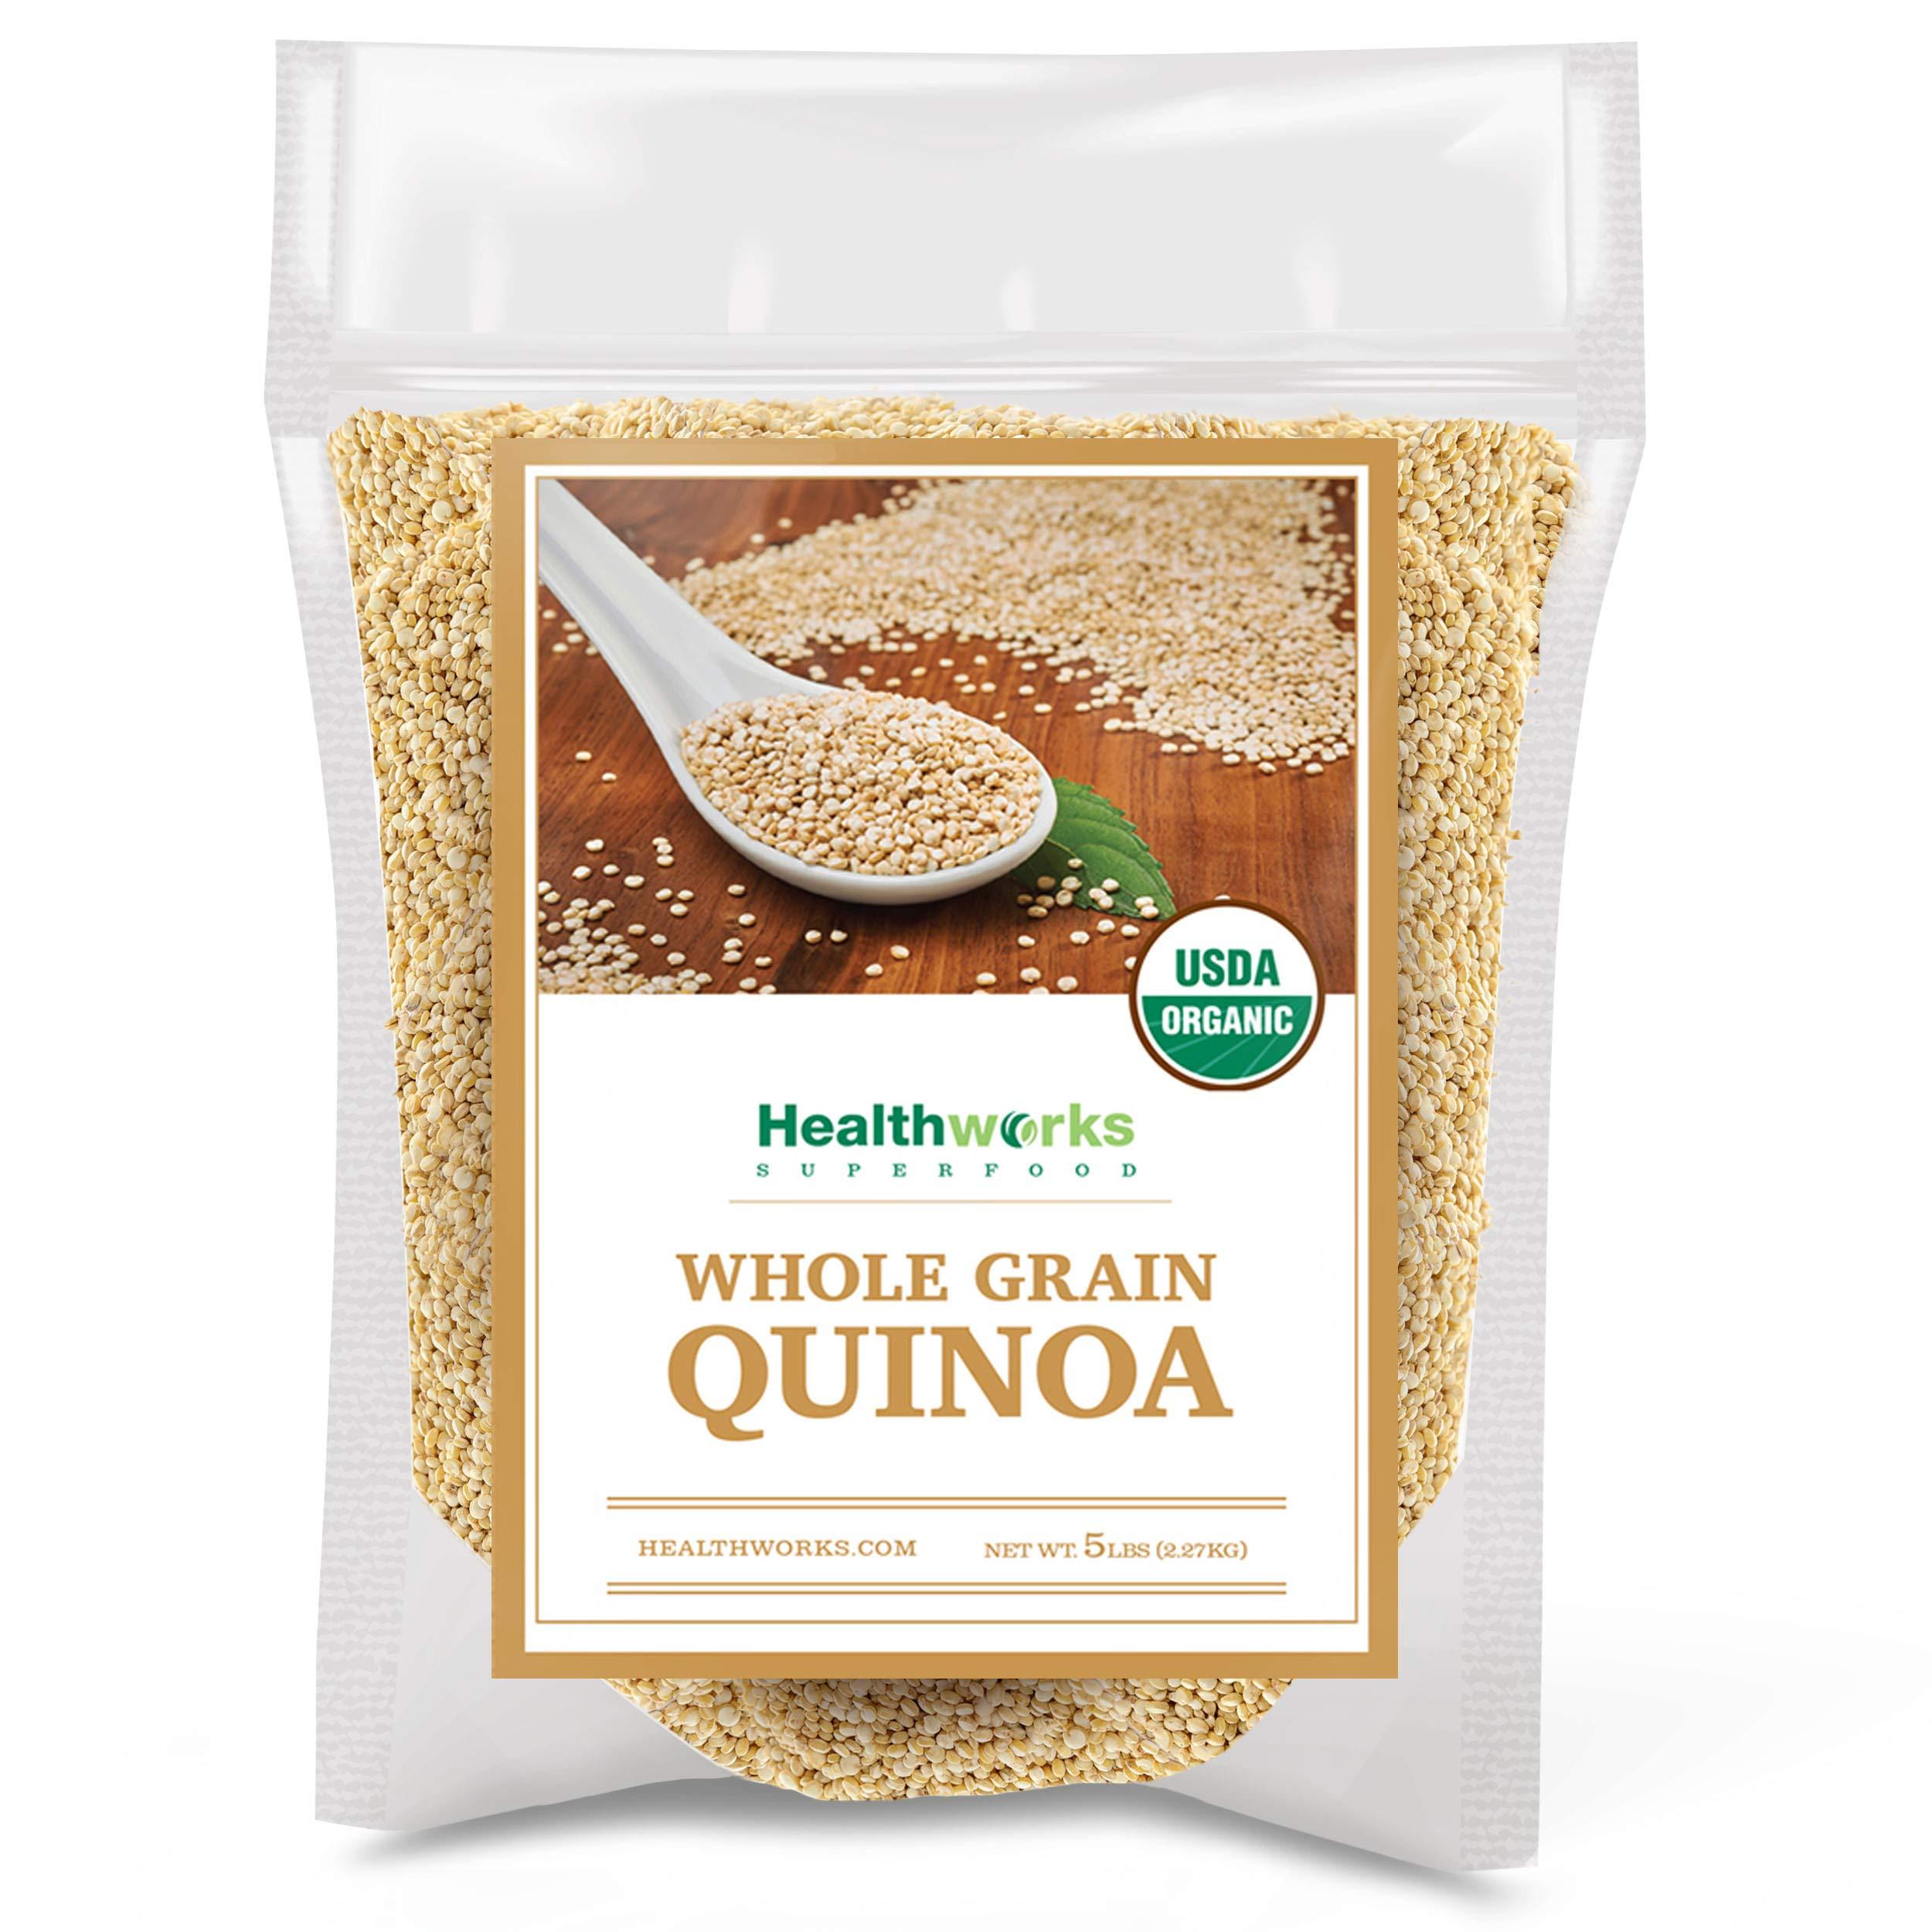 Healthworks Quinoa White Whole Grain Raw Organic (80 Ounces / 5 Pounds) | Protein, Fiber & Iron | Peruvian Origin | Rice & Pasta Substitute by Healthworks